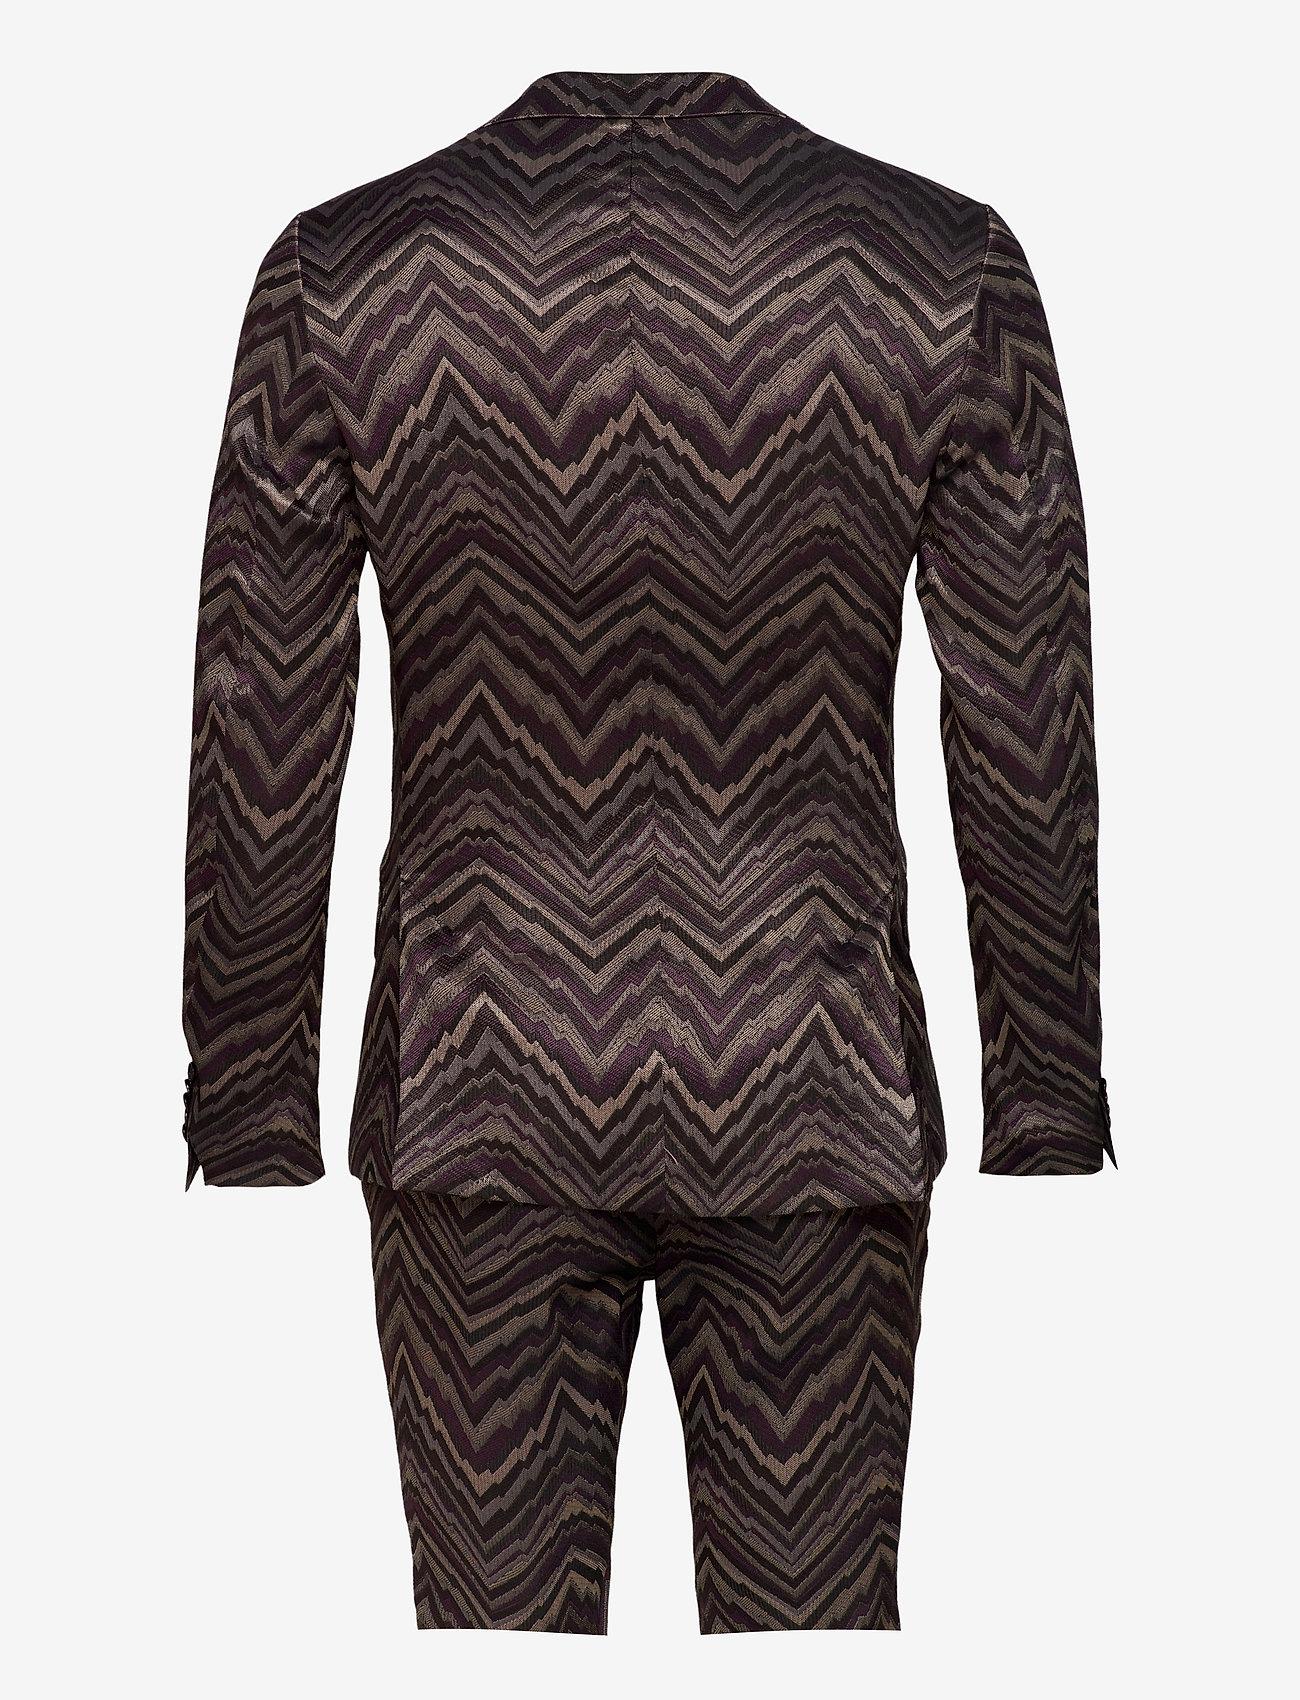 Bertoni - Suit Karlsen -Bloch - enkelknäppta kostymer - 295 black berry - 1